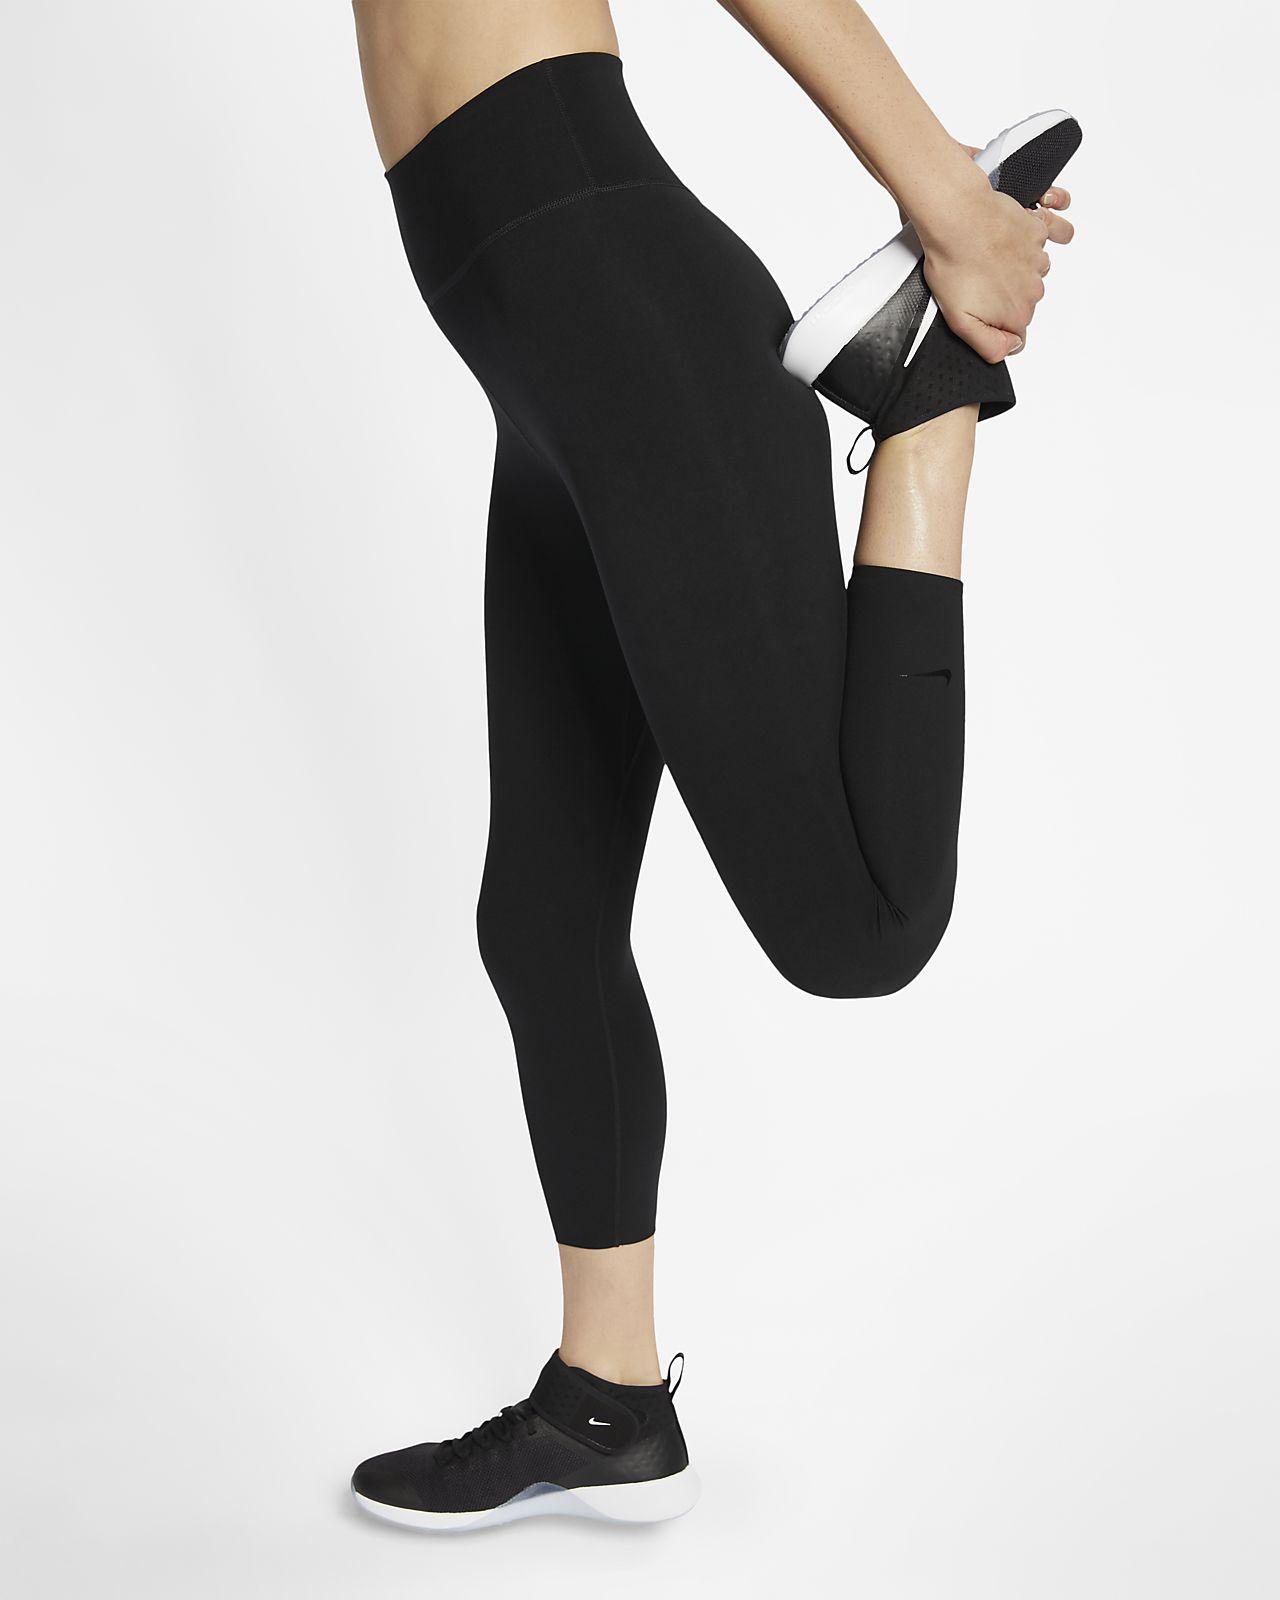 Женские укороченные тайтсы Nike One Luxe